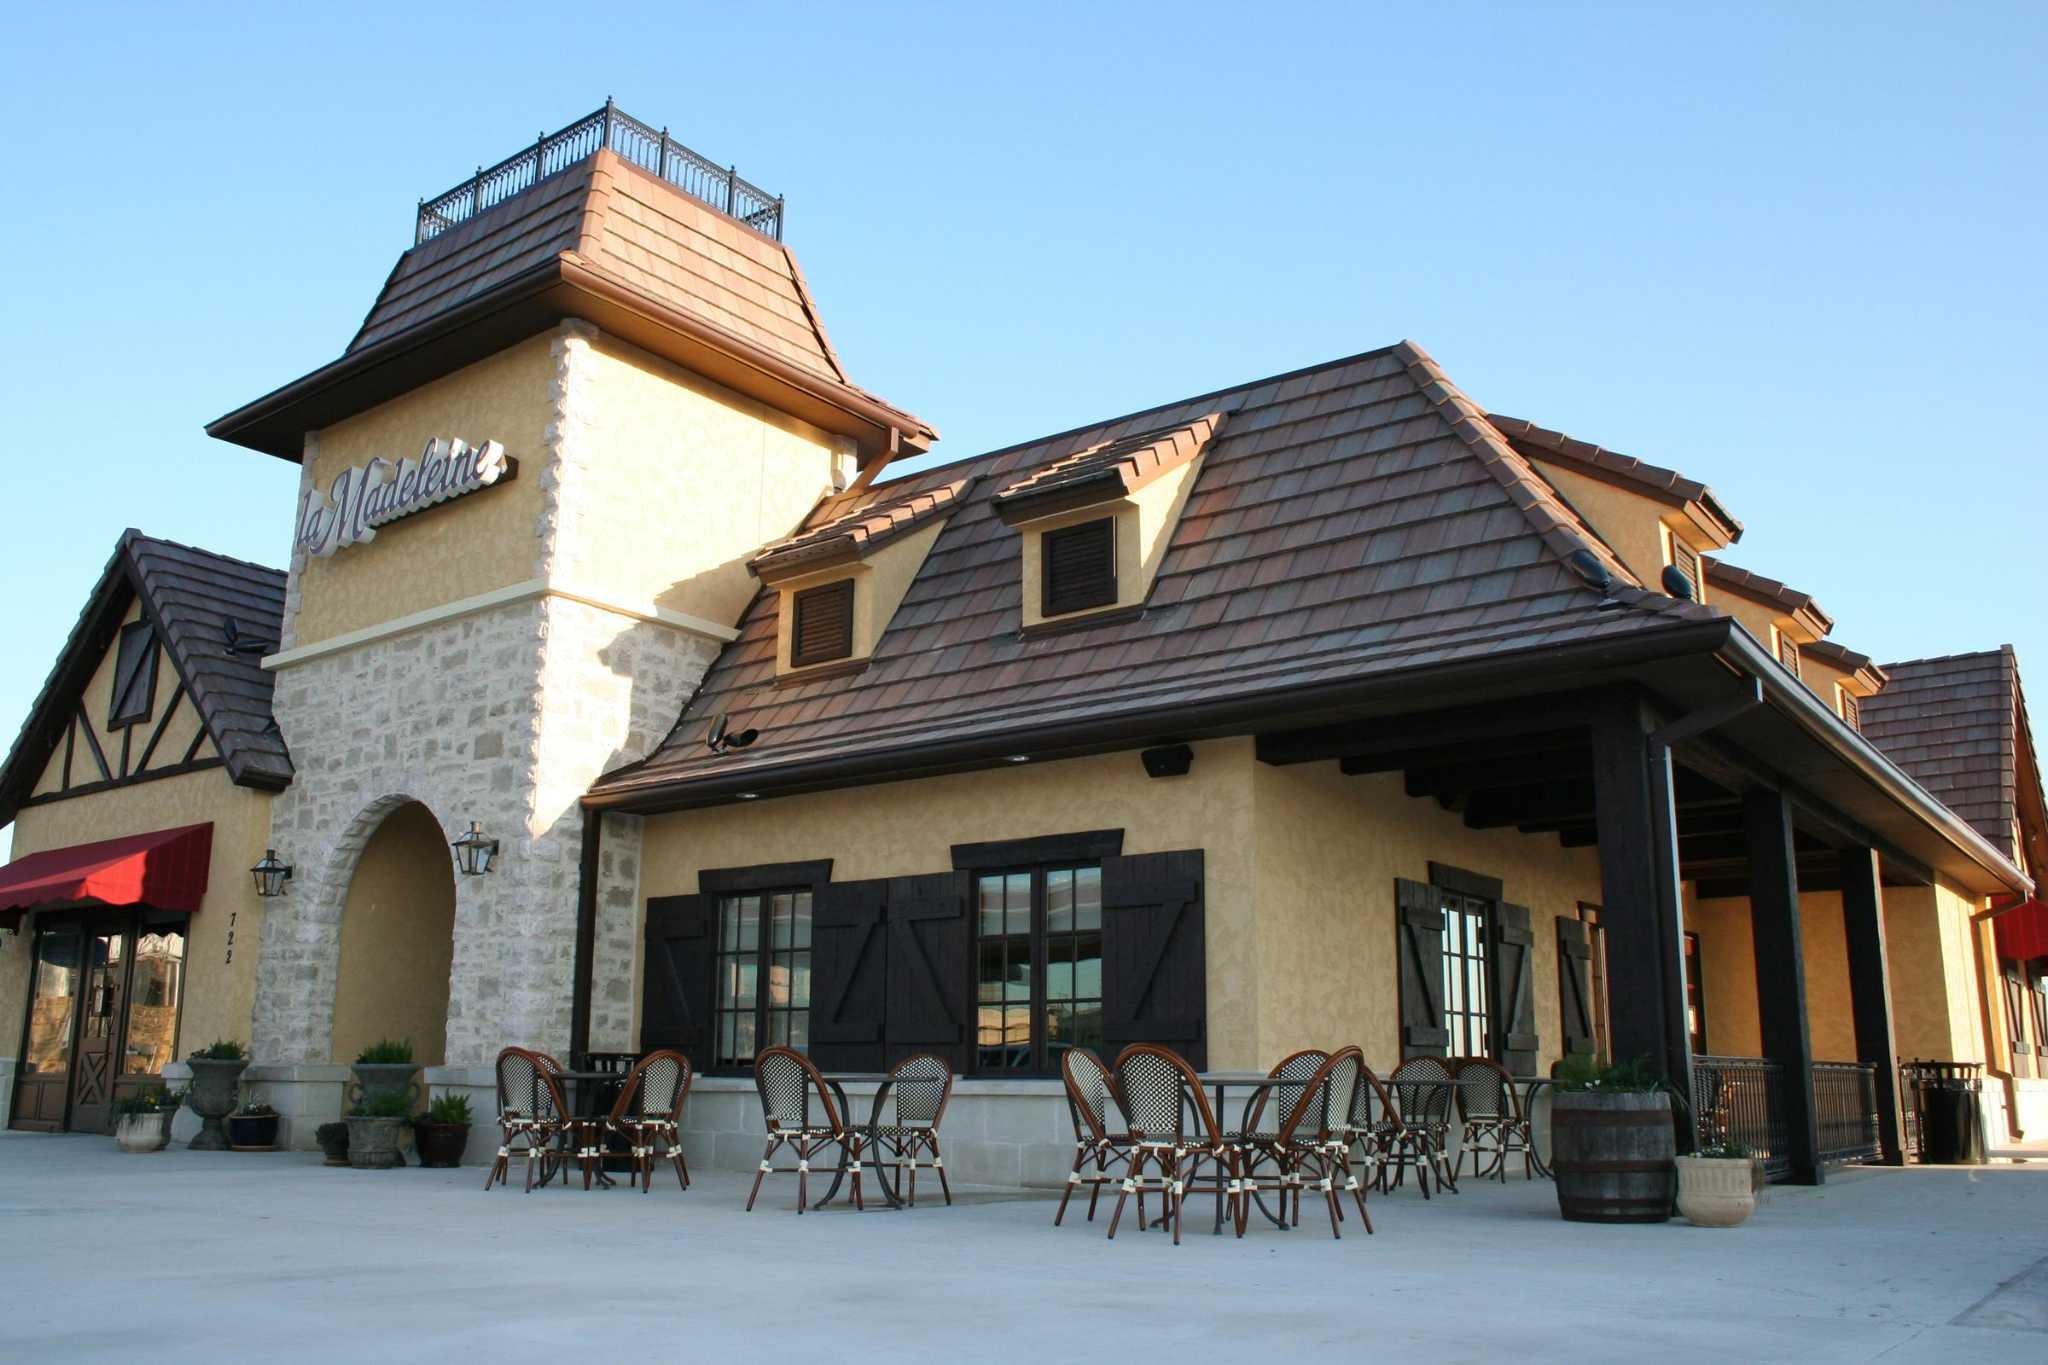 La Madeleine opens first location in Live Oak - San Antonio Express-News